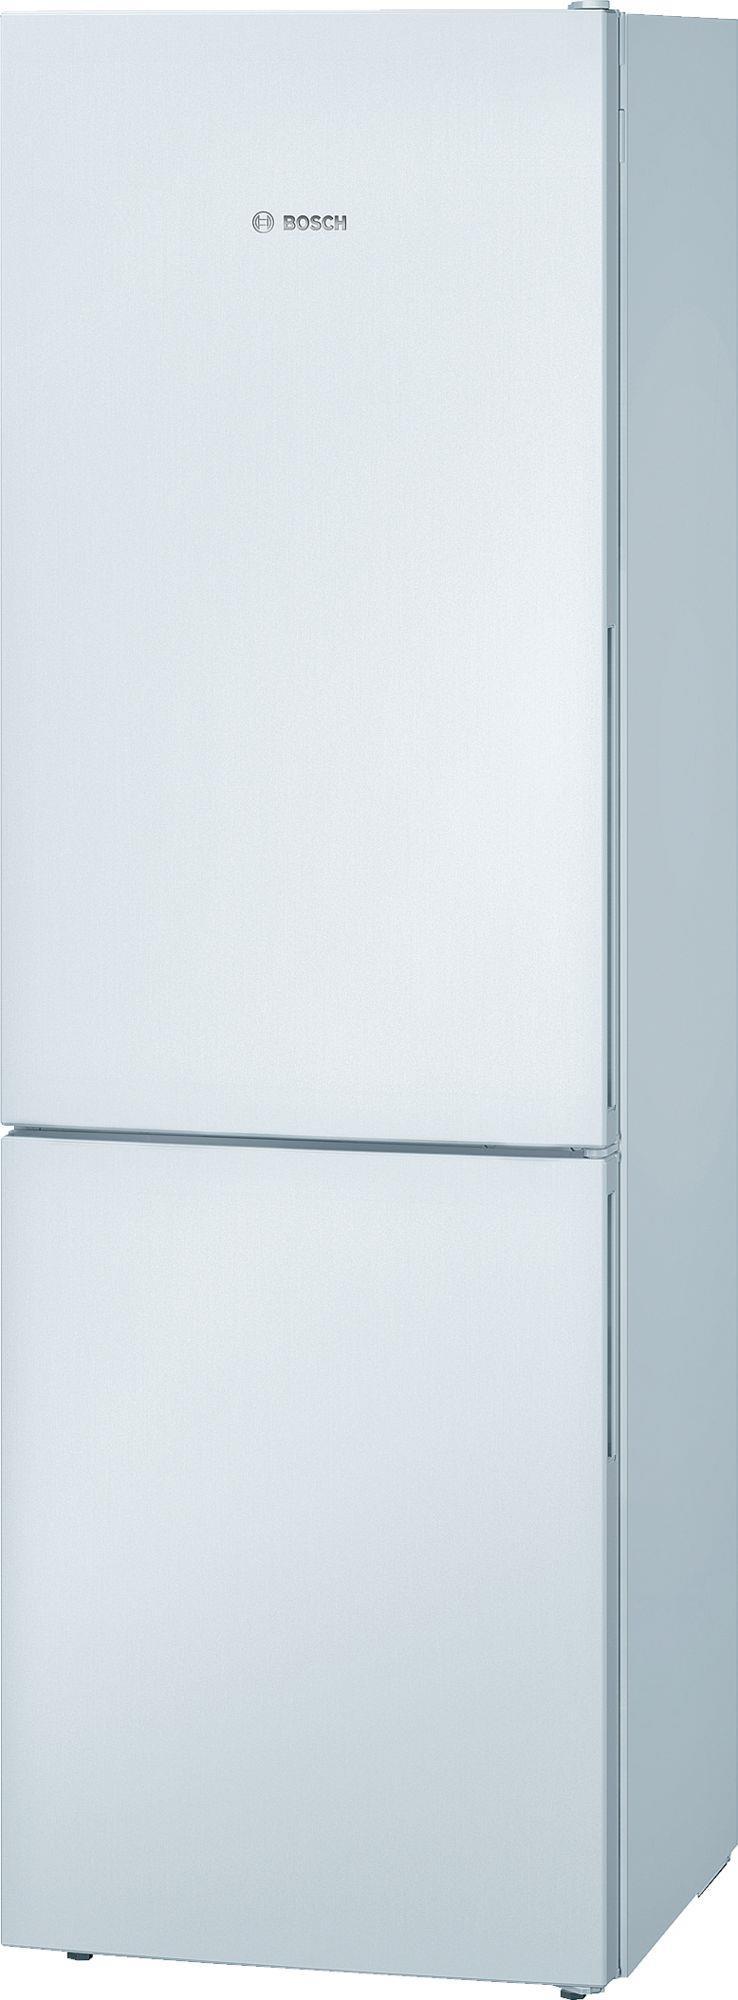 Bosch KGV36VW22 (600x1860x650mm White A+) Ledusskapis